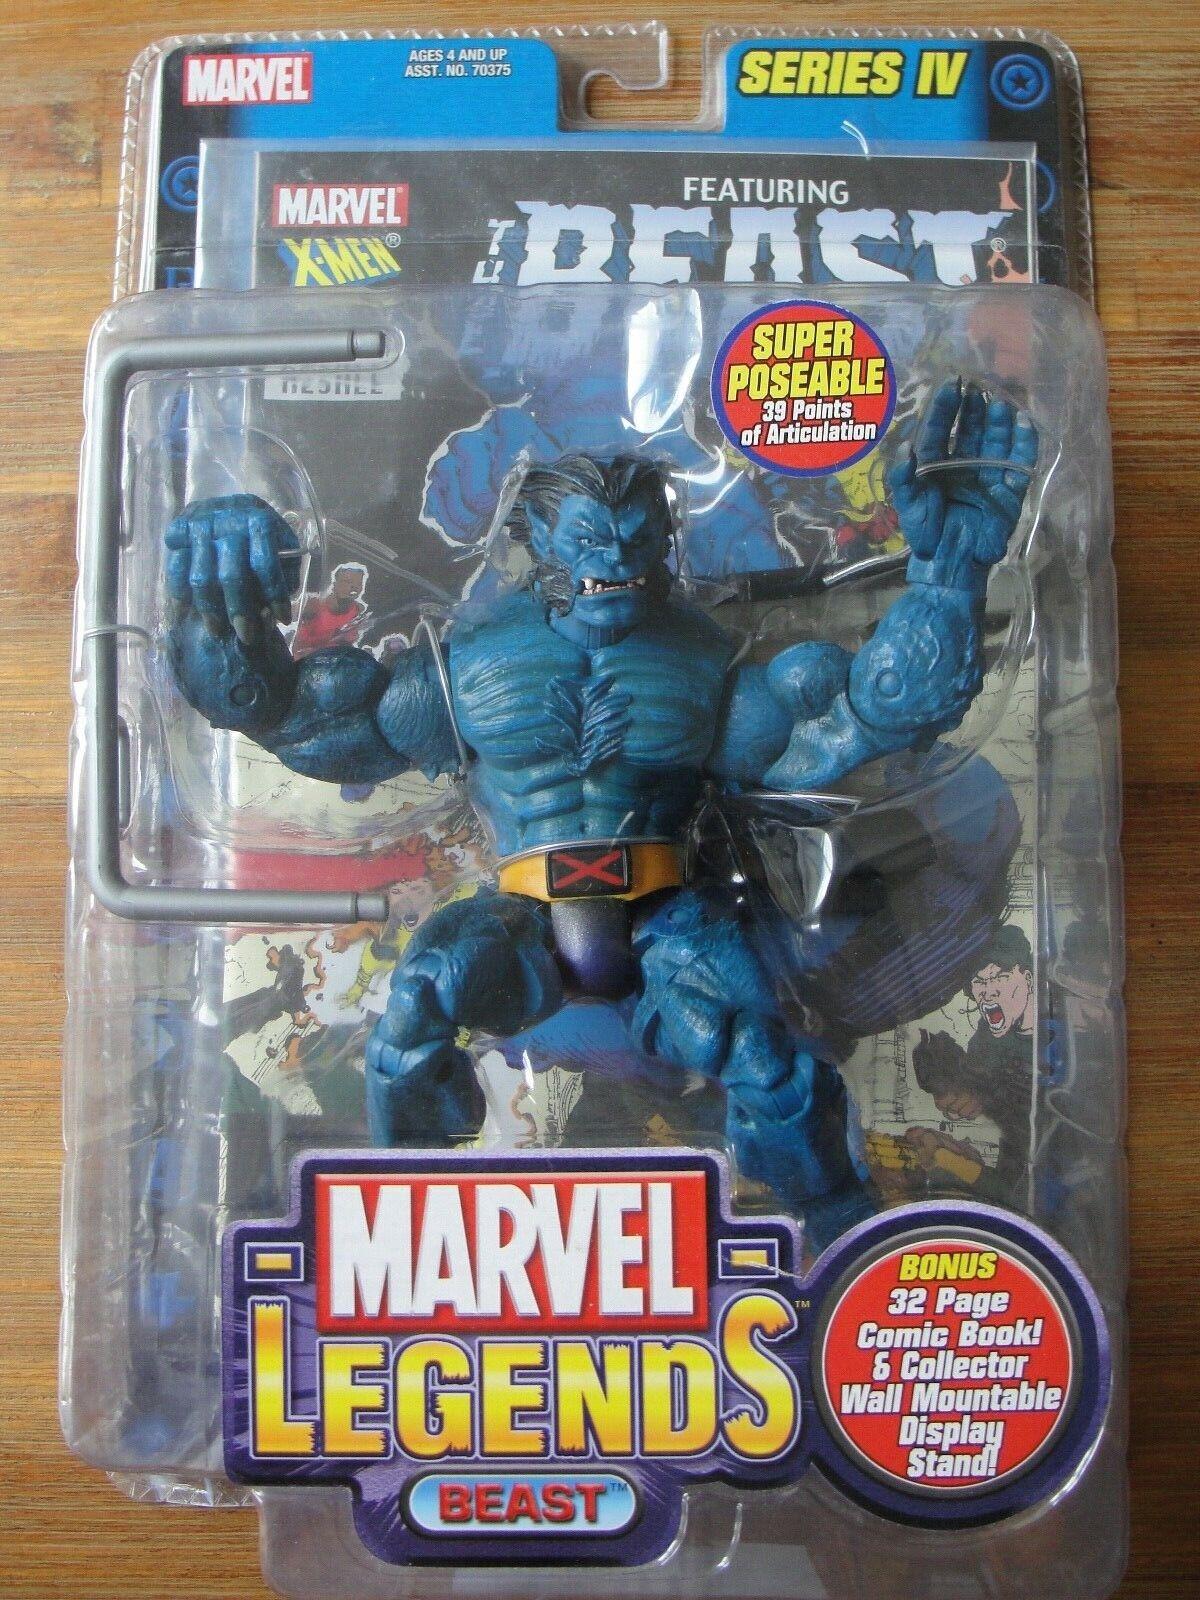 comprar ahora JugueteBiz Marvel Marvel Marvel Legends Series Iv súper Poseable Bestia Figura Nuevo  buscando agente de ventas